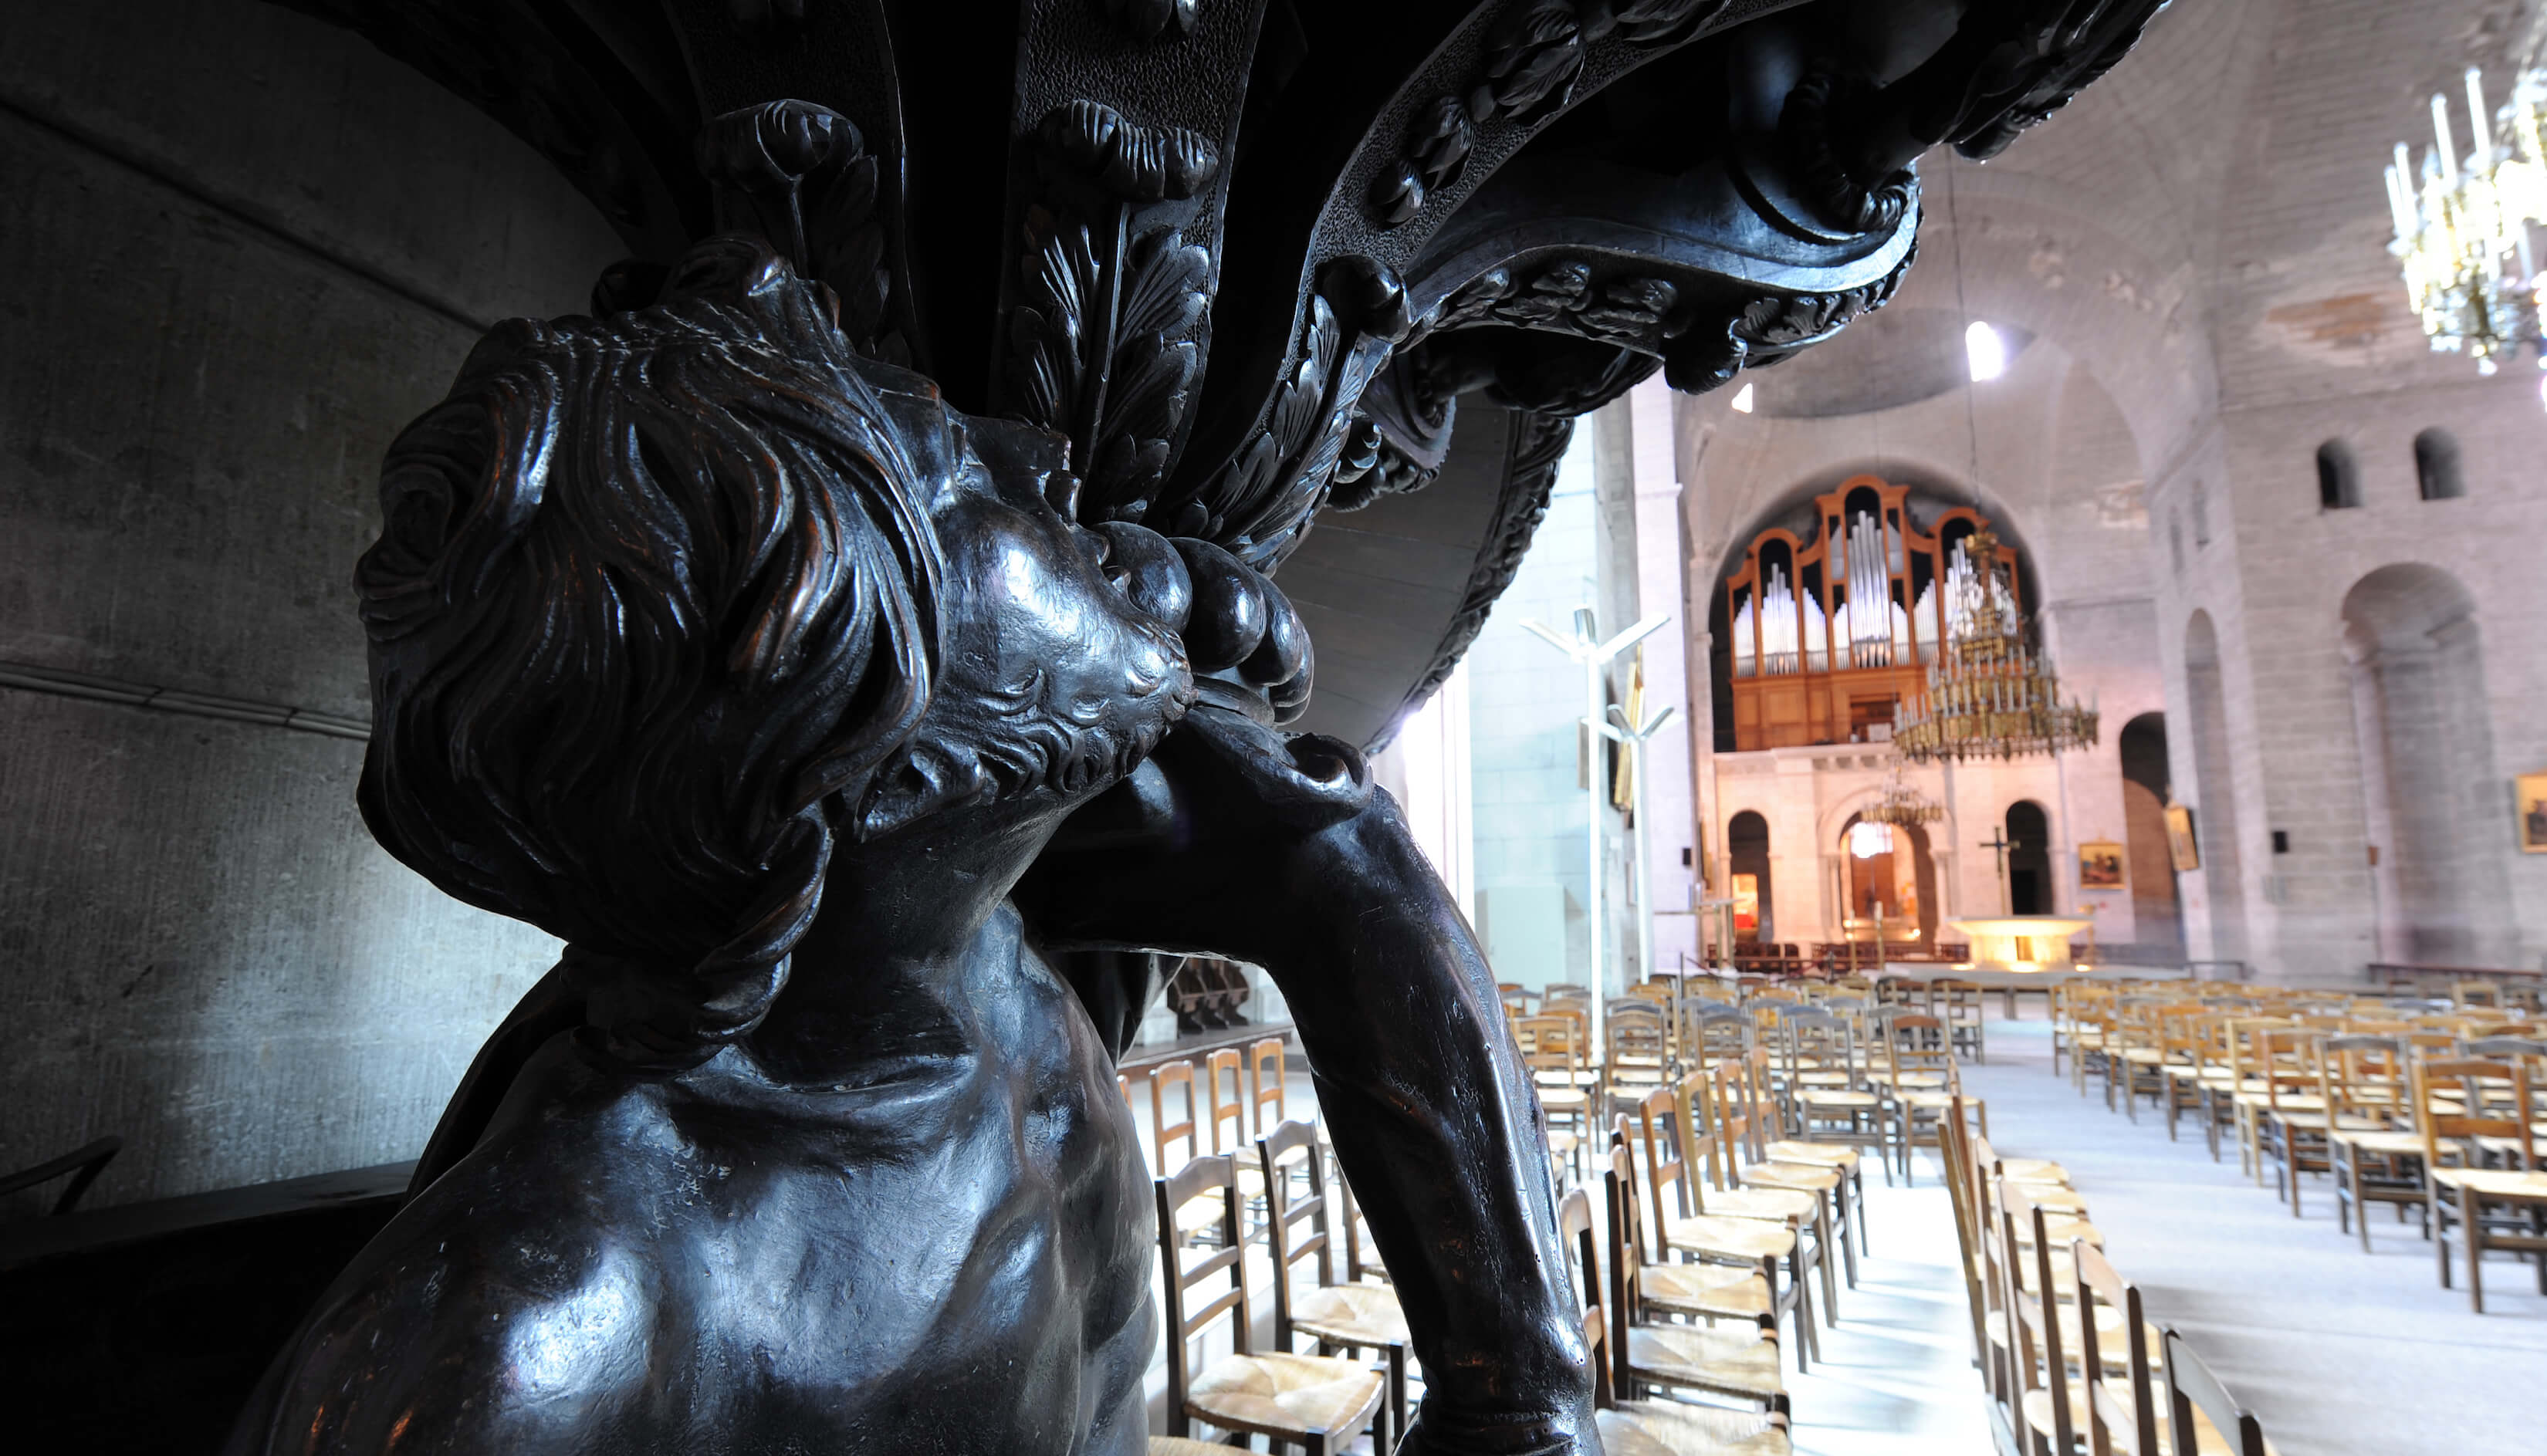 Cathédrale Saint-Front©ACIR / JJ Gelbart